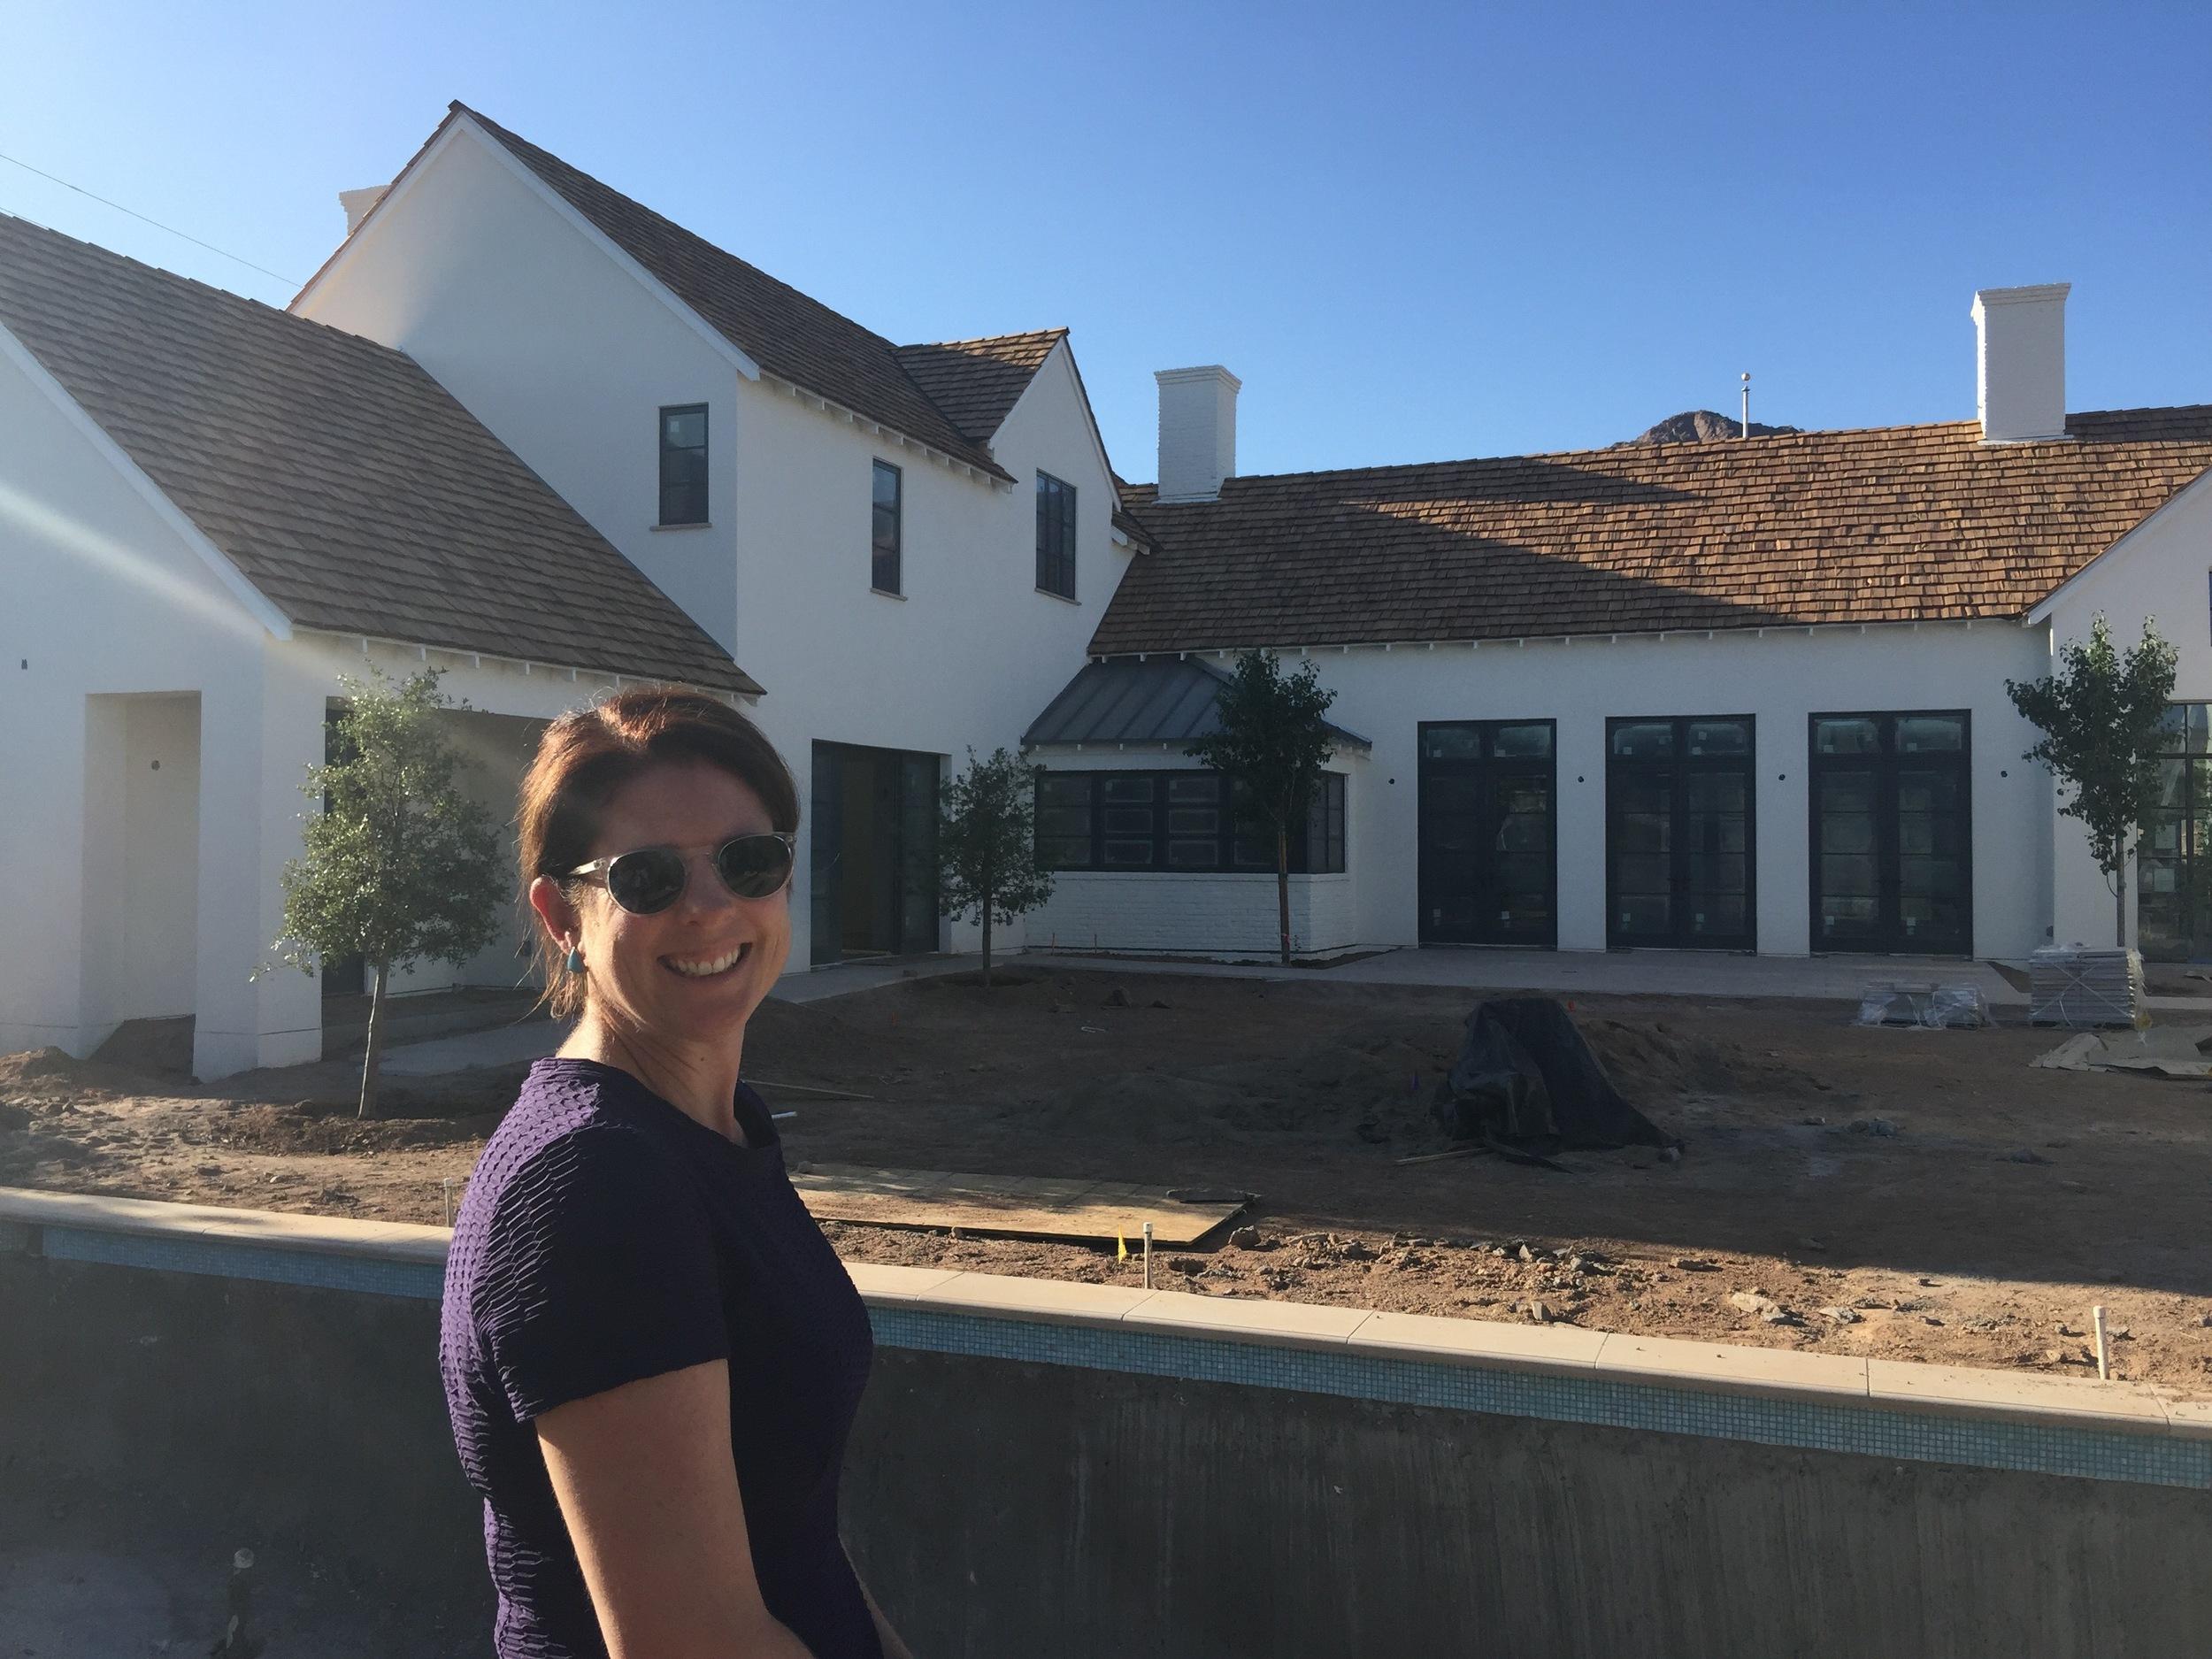 Candelaria Design Architect, Meredith Thomson at her Modern Farmhouse creation in Arcadia.